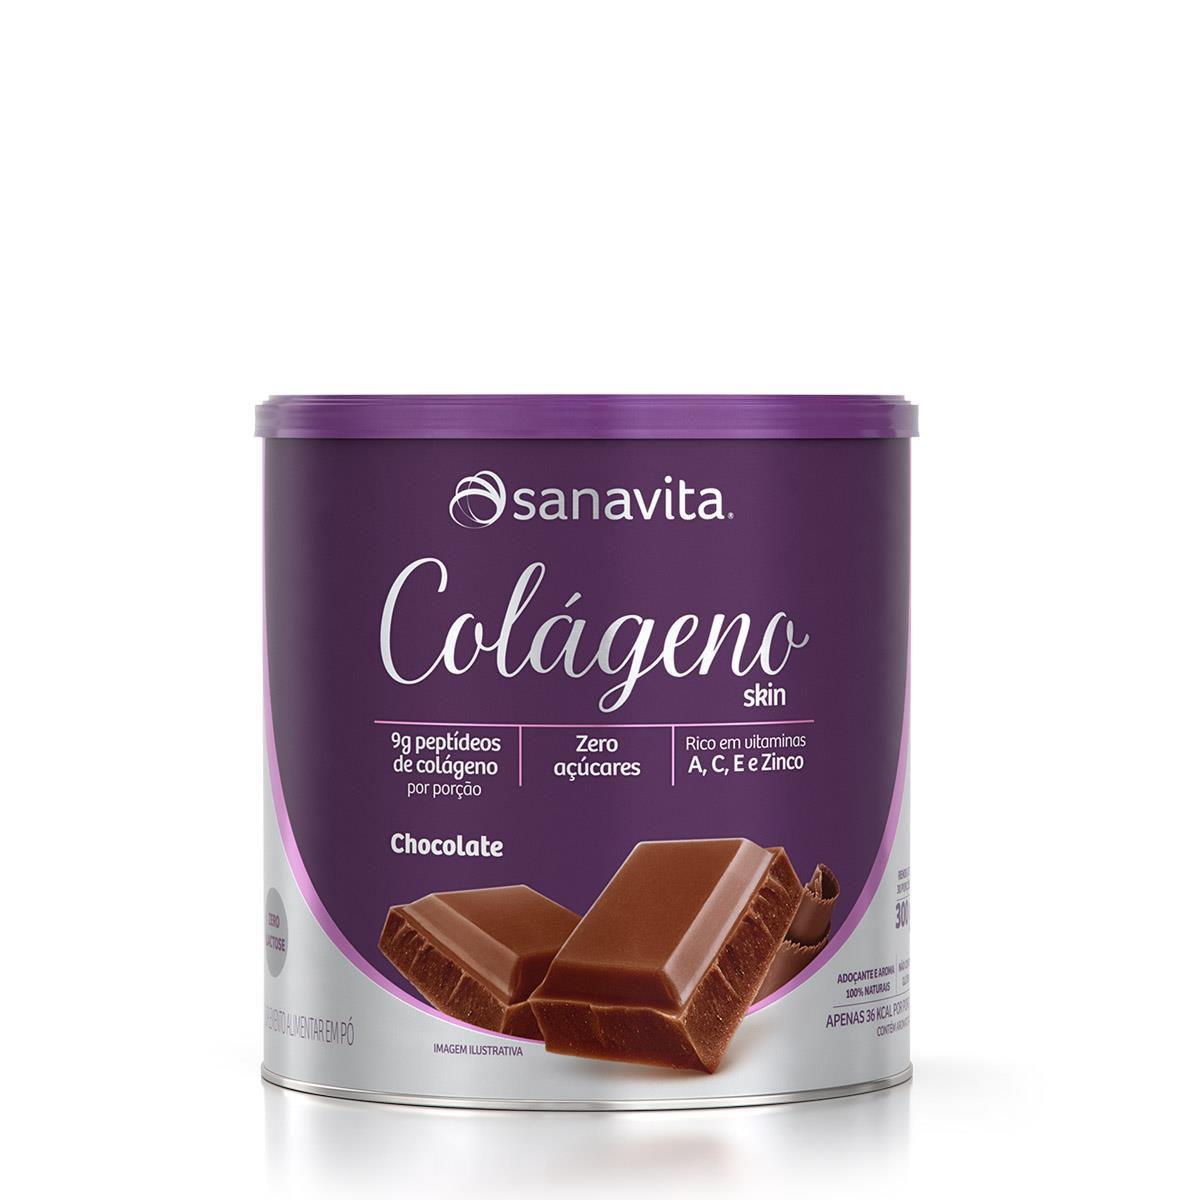 COLÁGENO SKIN CHOCOLATE 300g - Sanavita